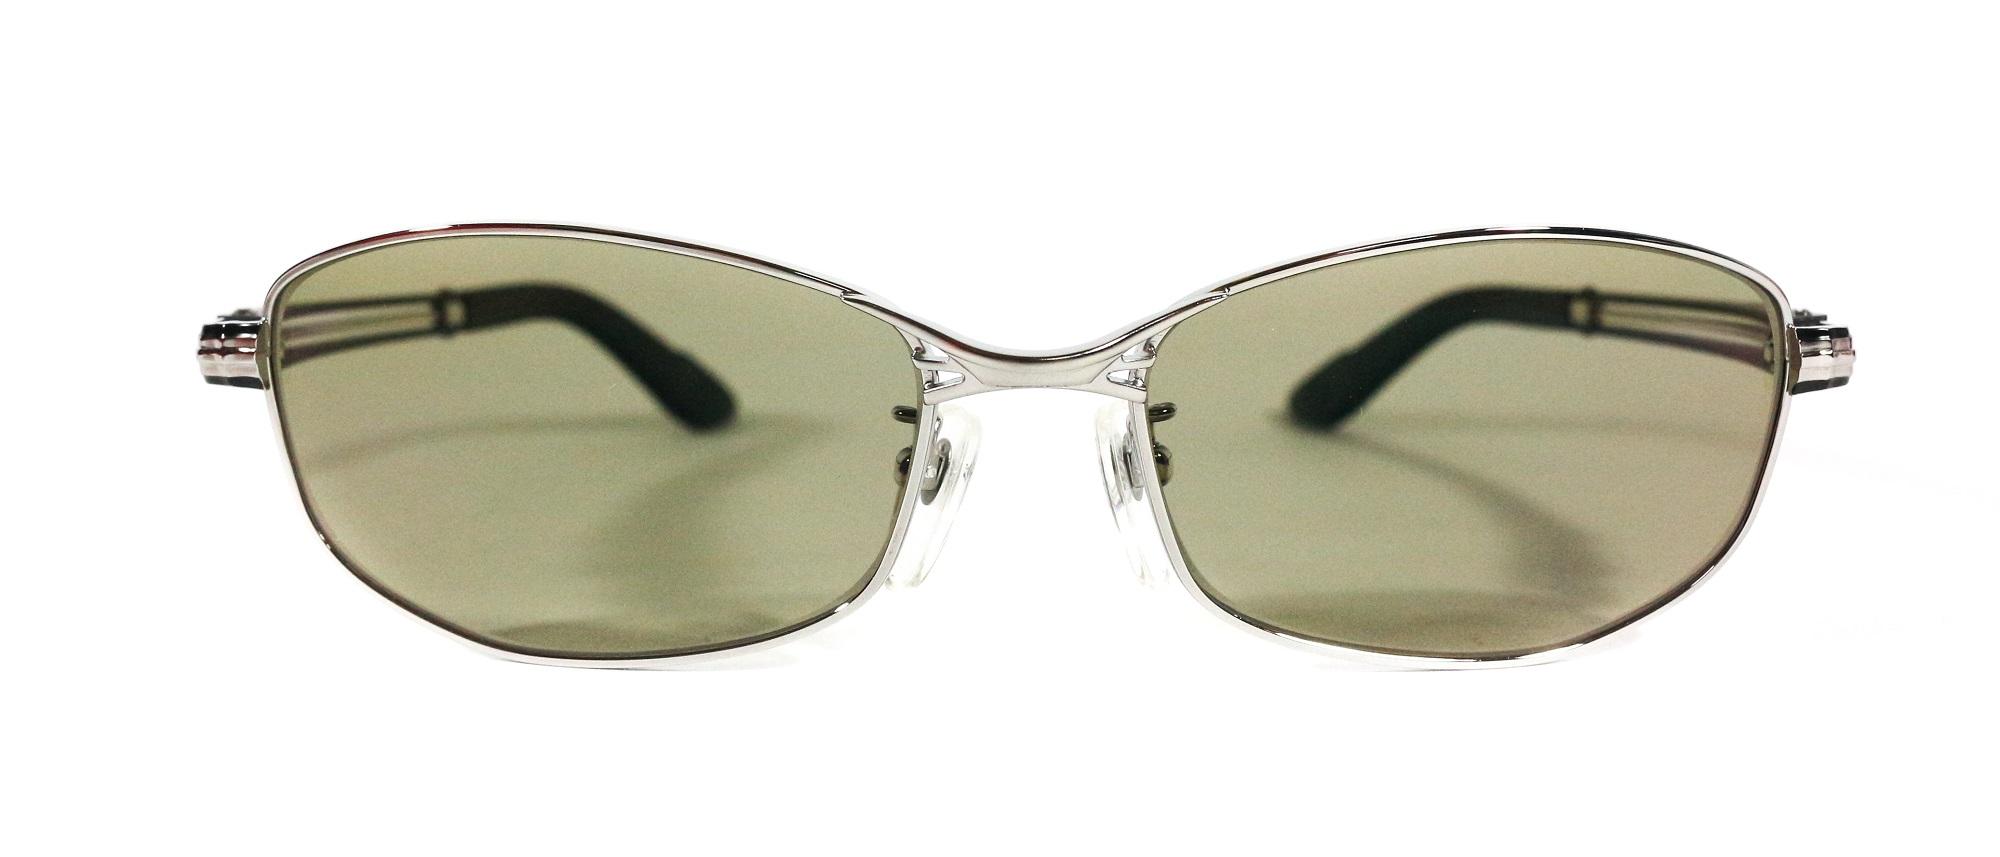 Zeque Polarised Fishing Sunglasses Feiz F-1330 MATTE CHROME TVS (3466)